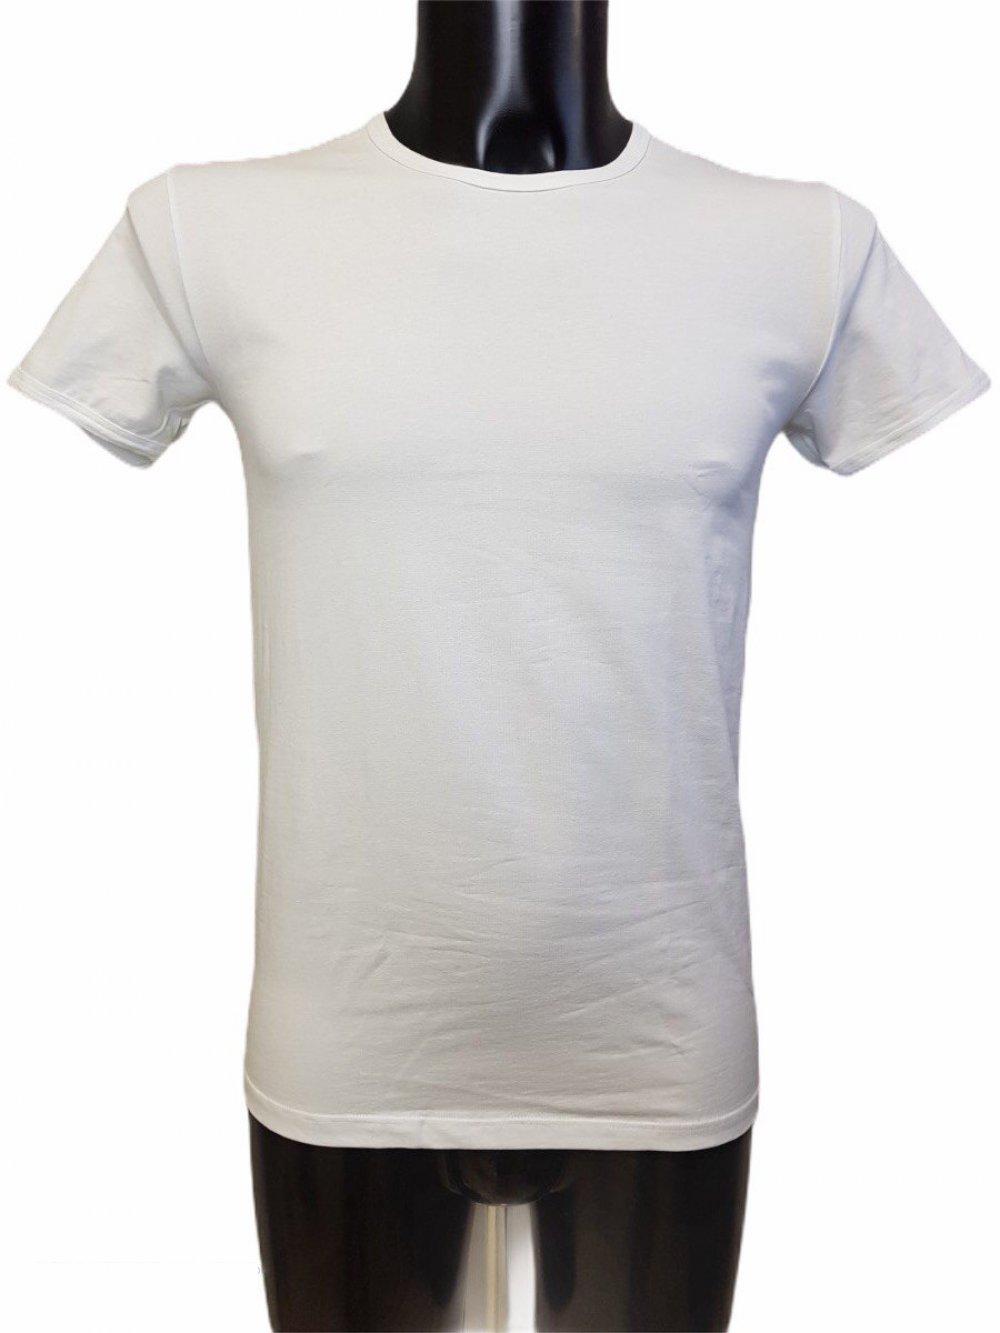 03858 23 T-Shirt Uomo Giro Collo Basso Liabel